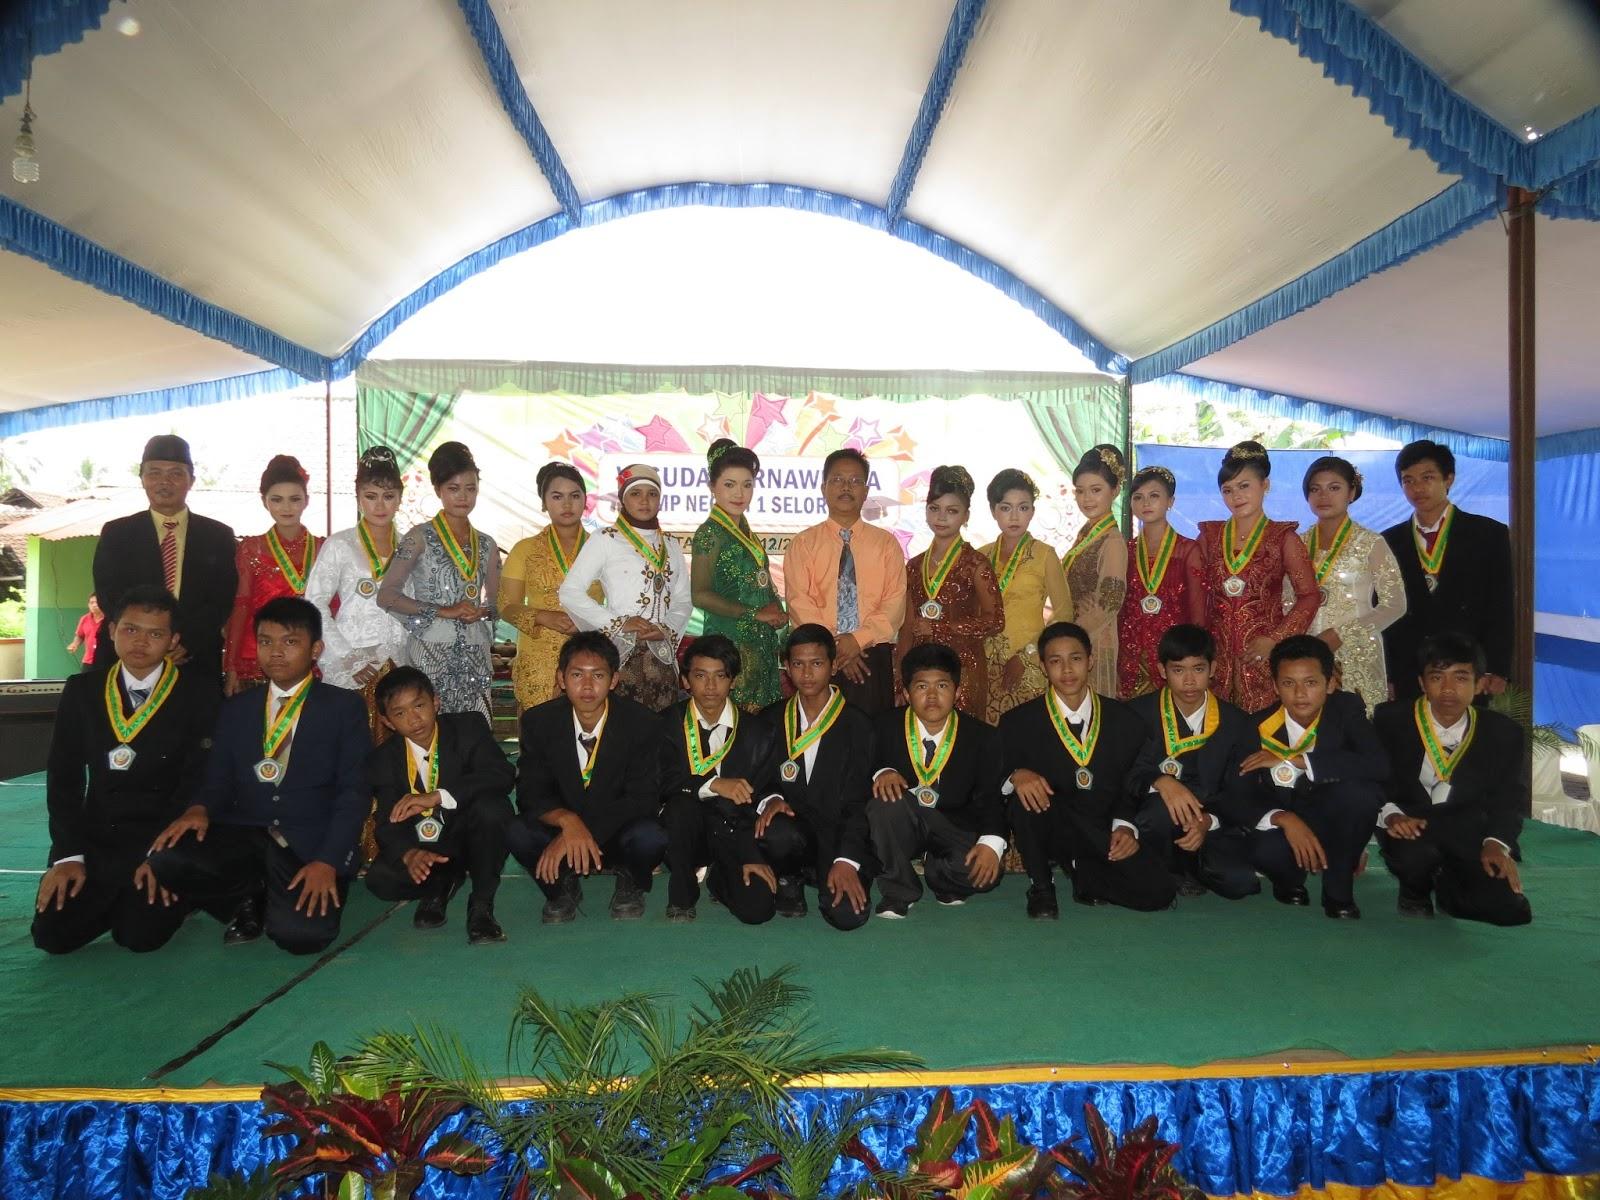 Perpisahan Wisuda Purnawiyata Smpn 1 Selorejo Tahun 2012 2013 Smp Negeri 1 Selorejo